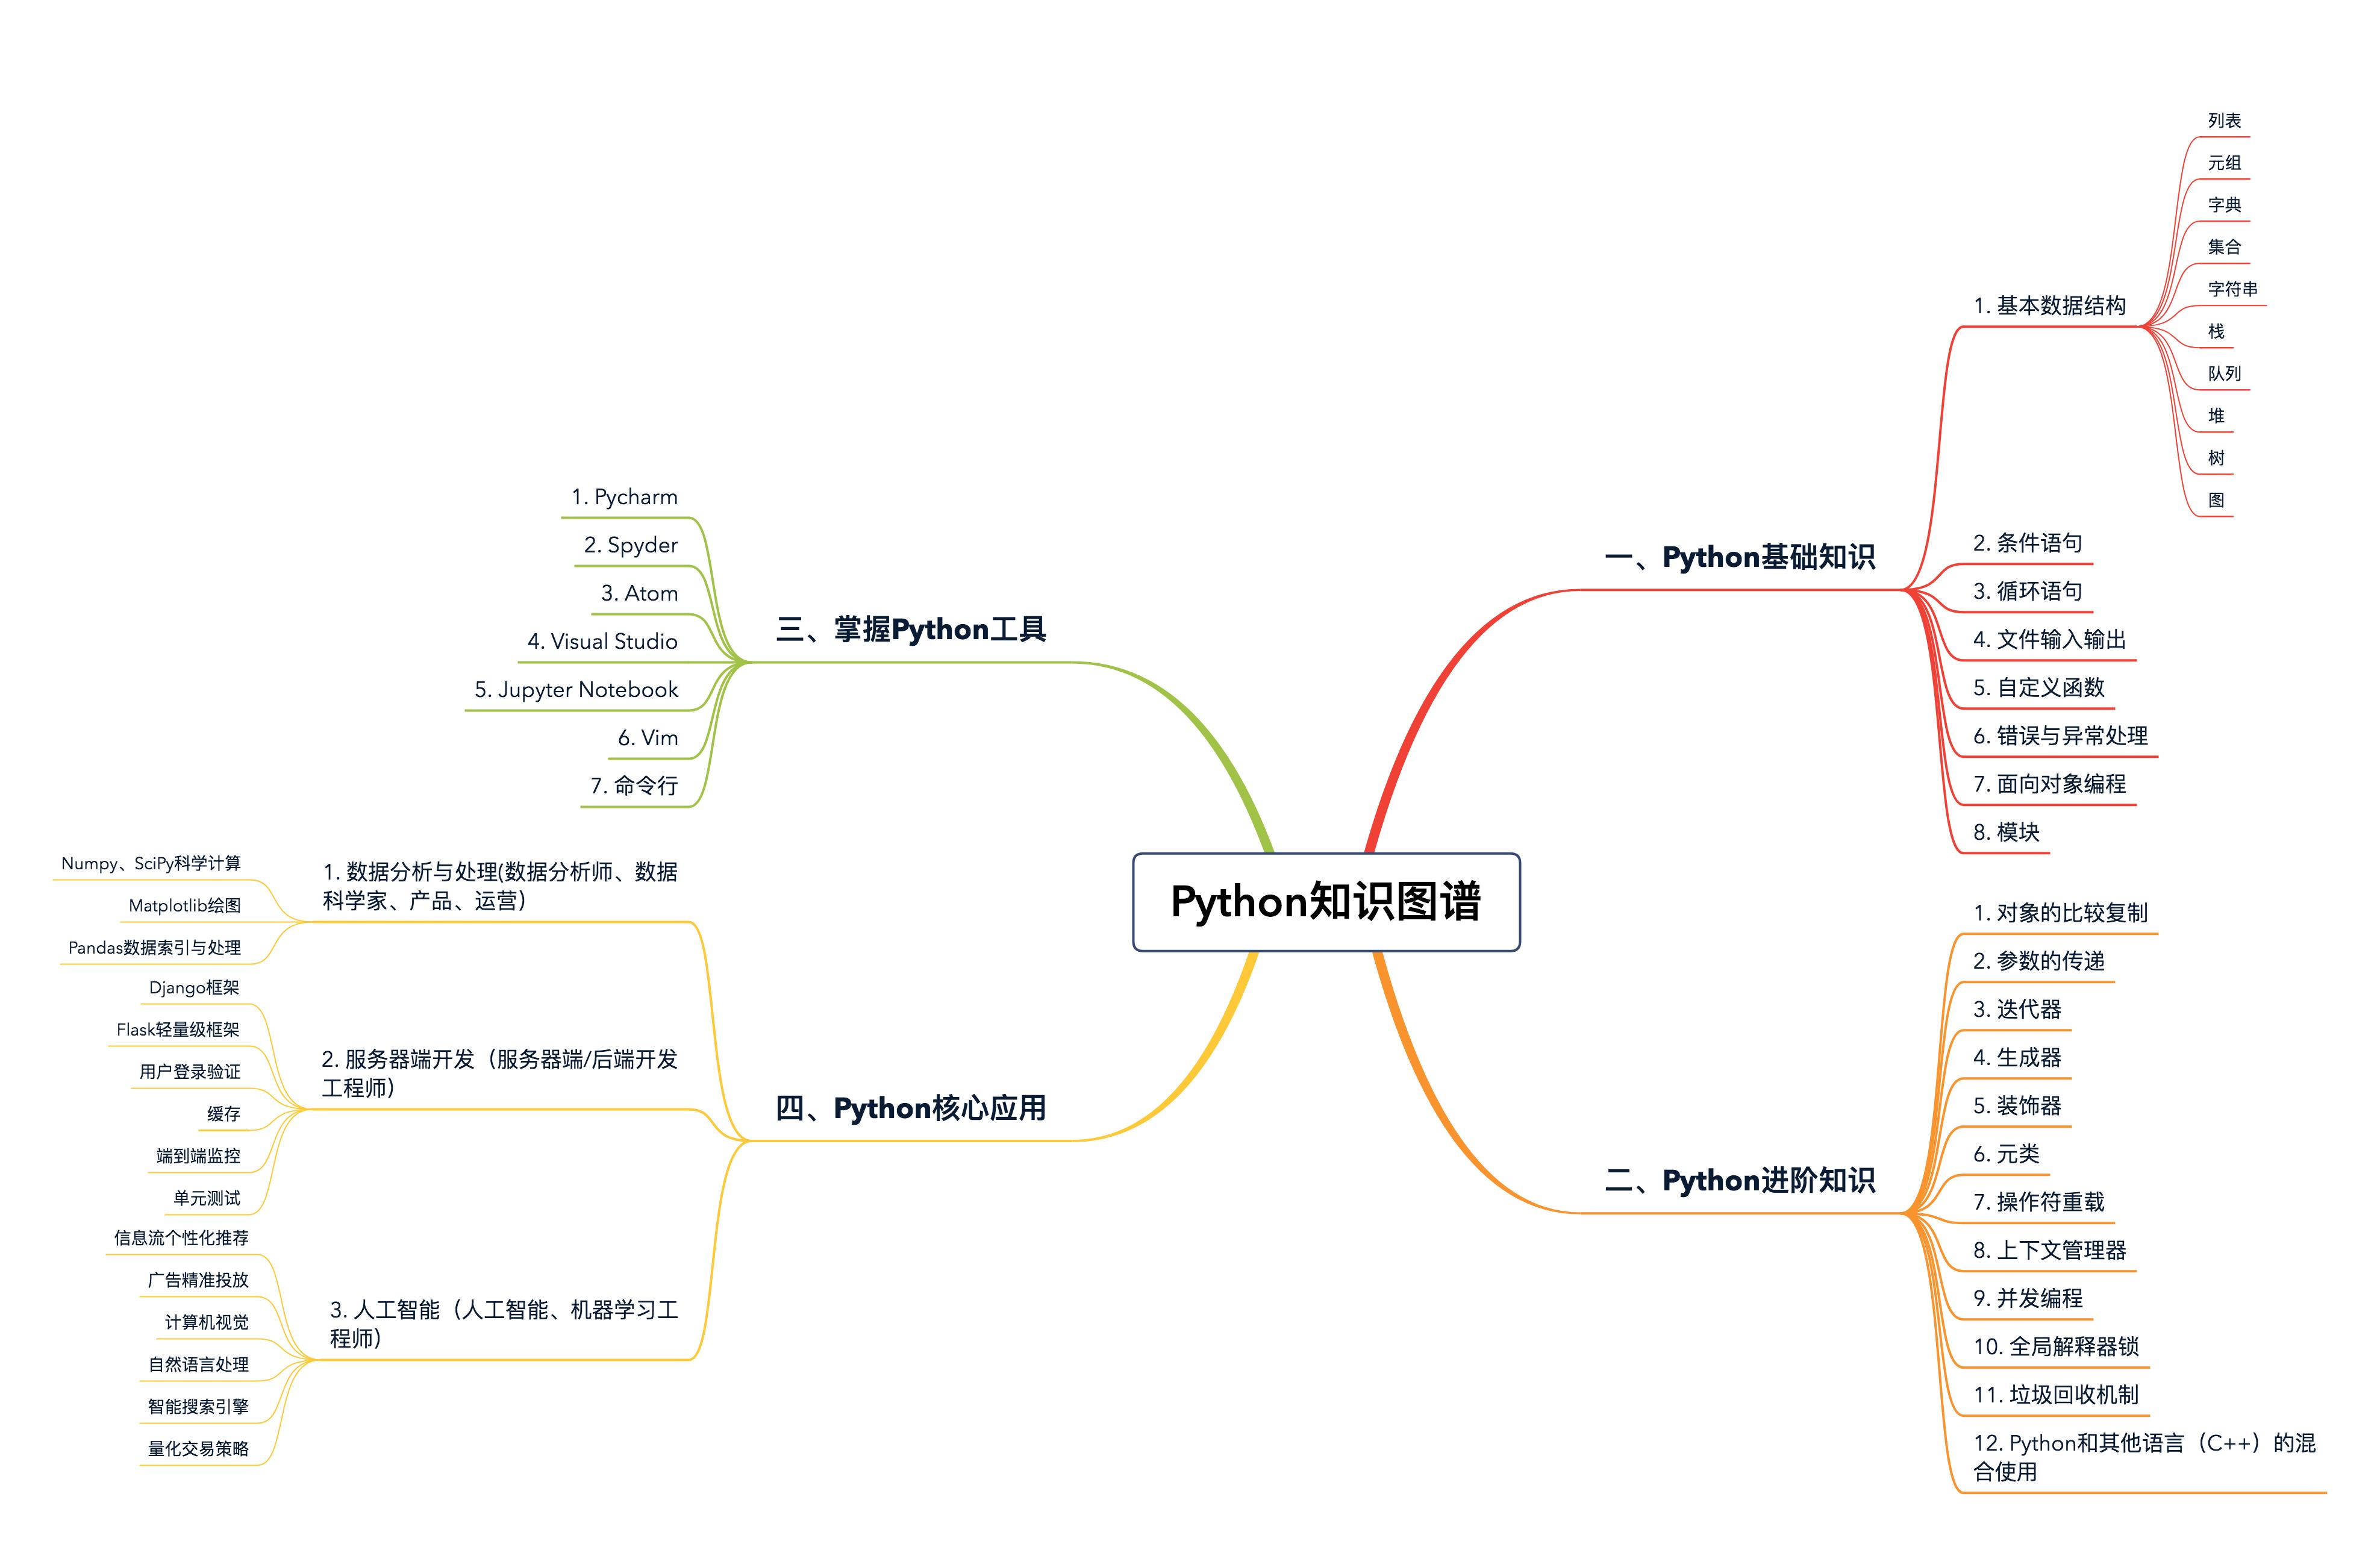 https://static001.geekbang.org/resource/image/2c/1d/2cfc18adf51b61ca8140561071d20c1d.png